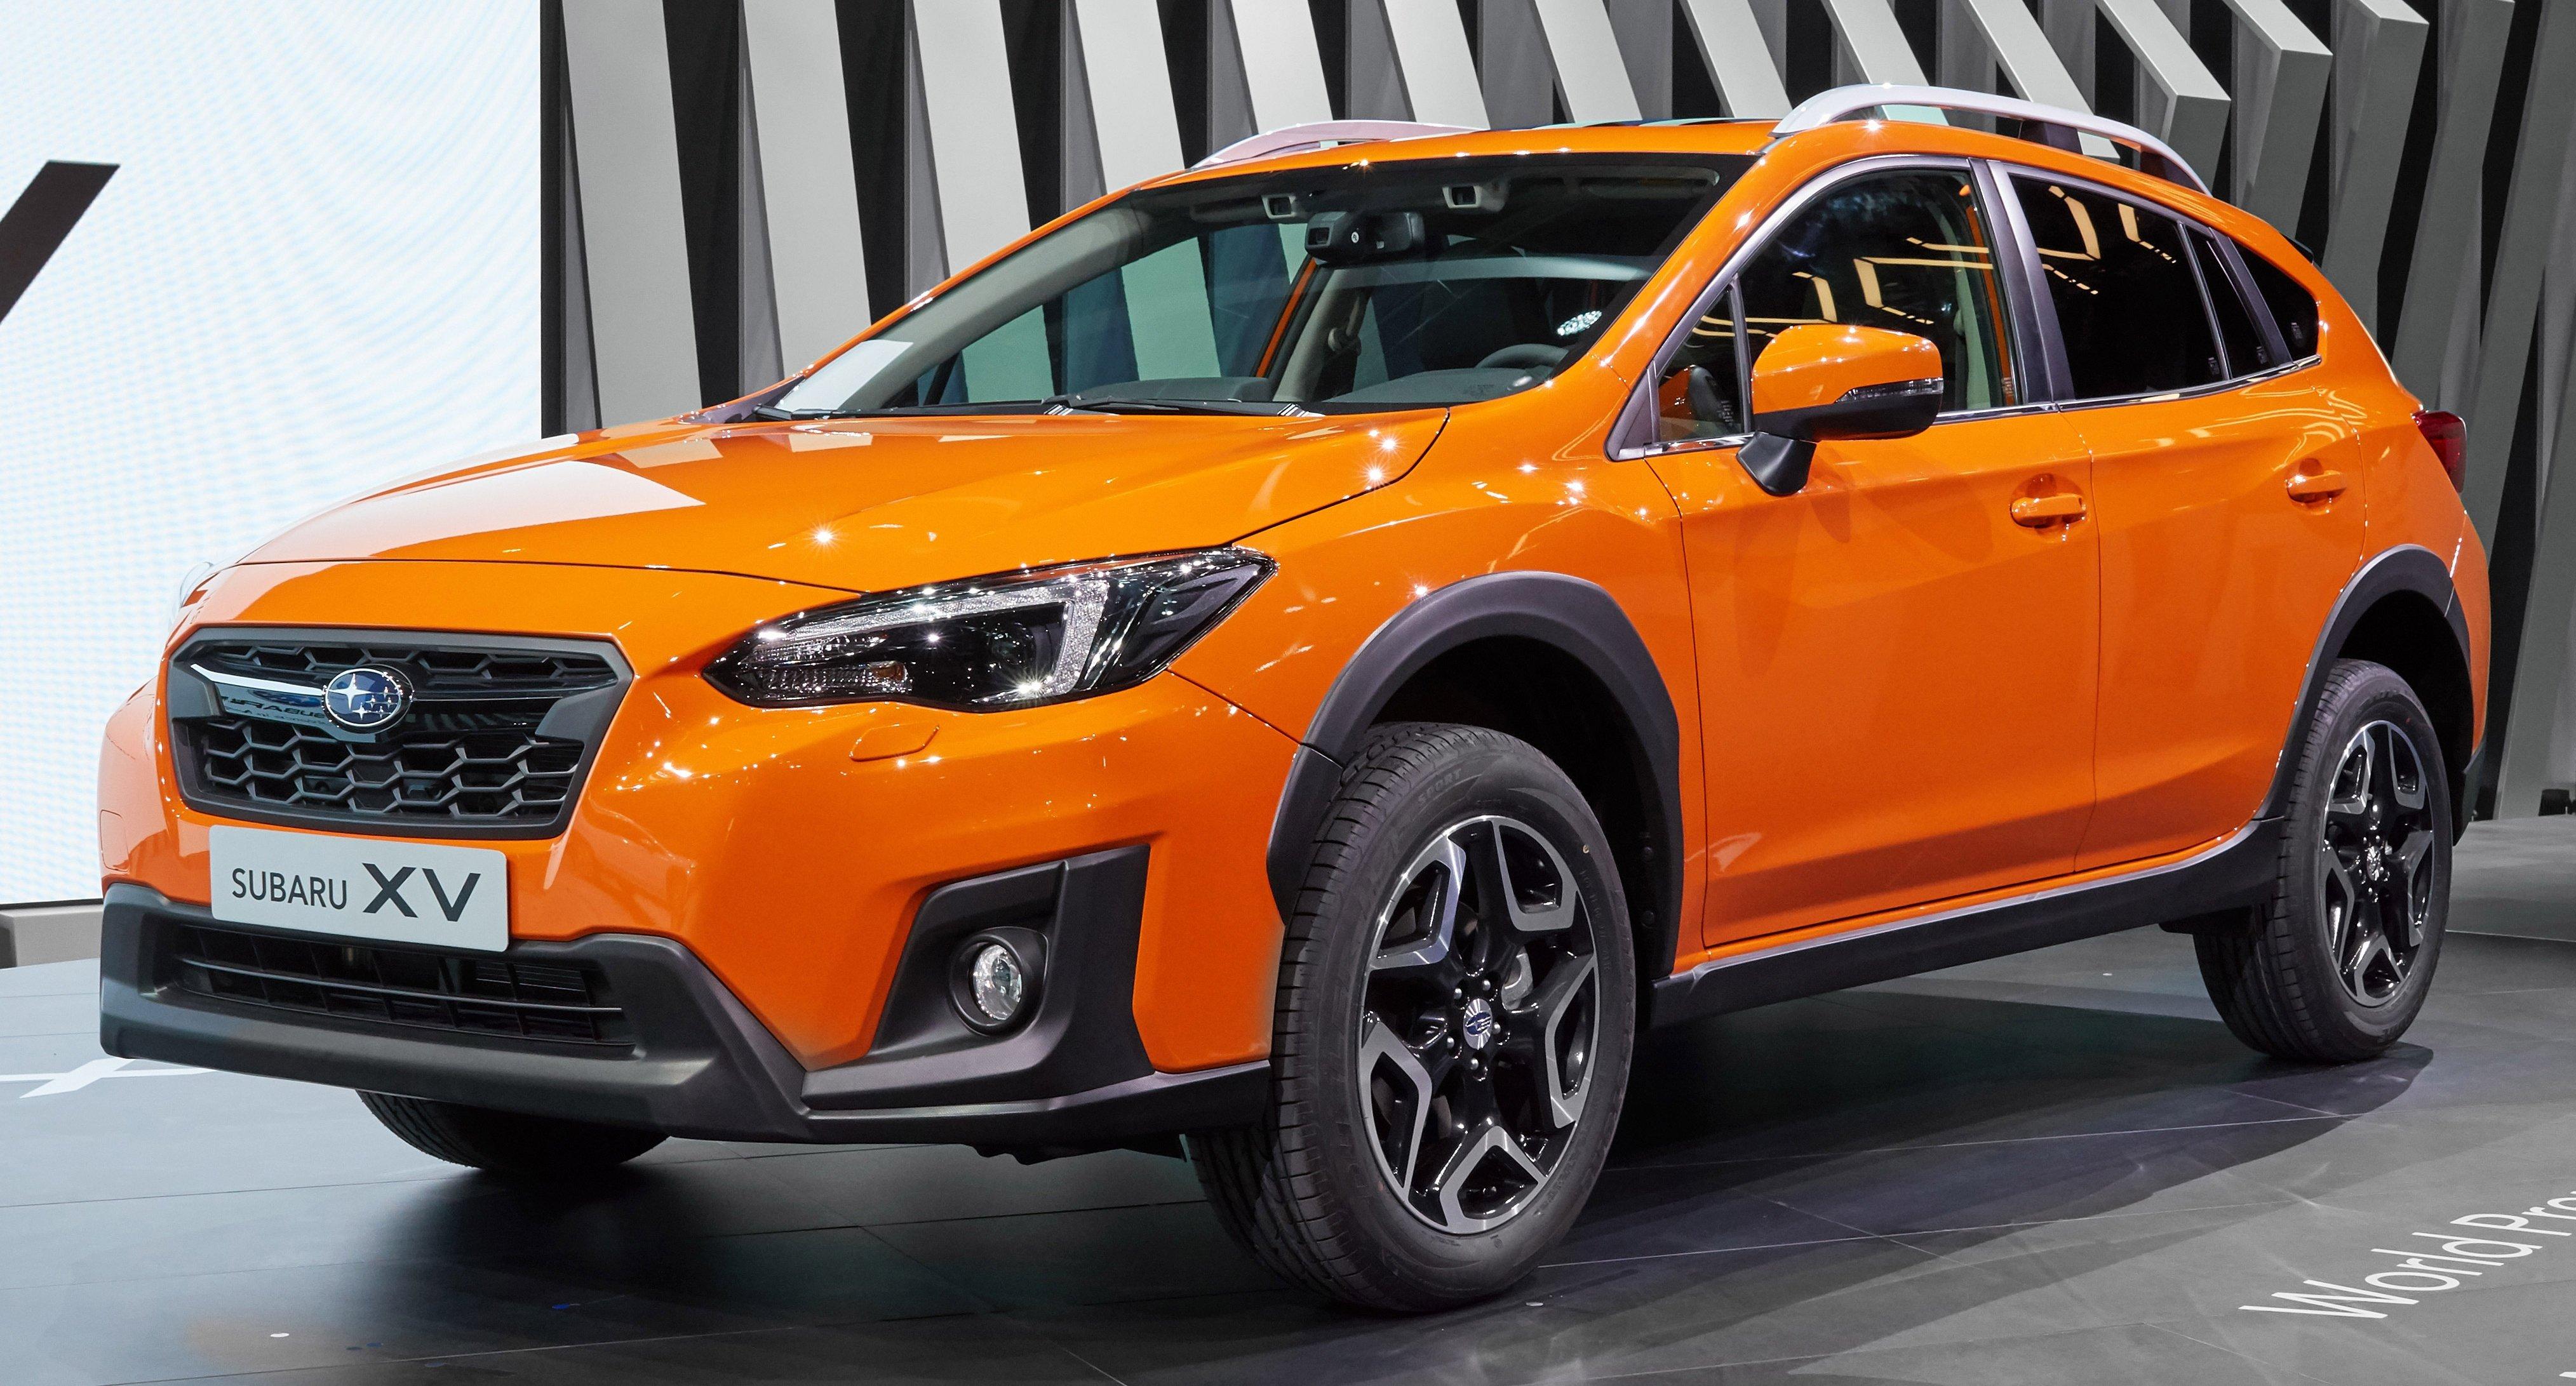 2018 Subaru Xv New Looks Better Dynamics Safety